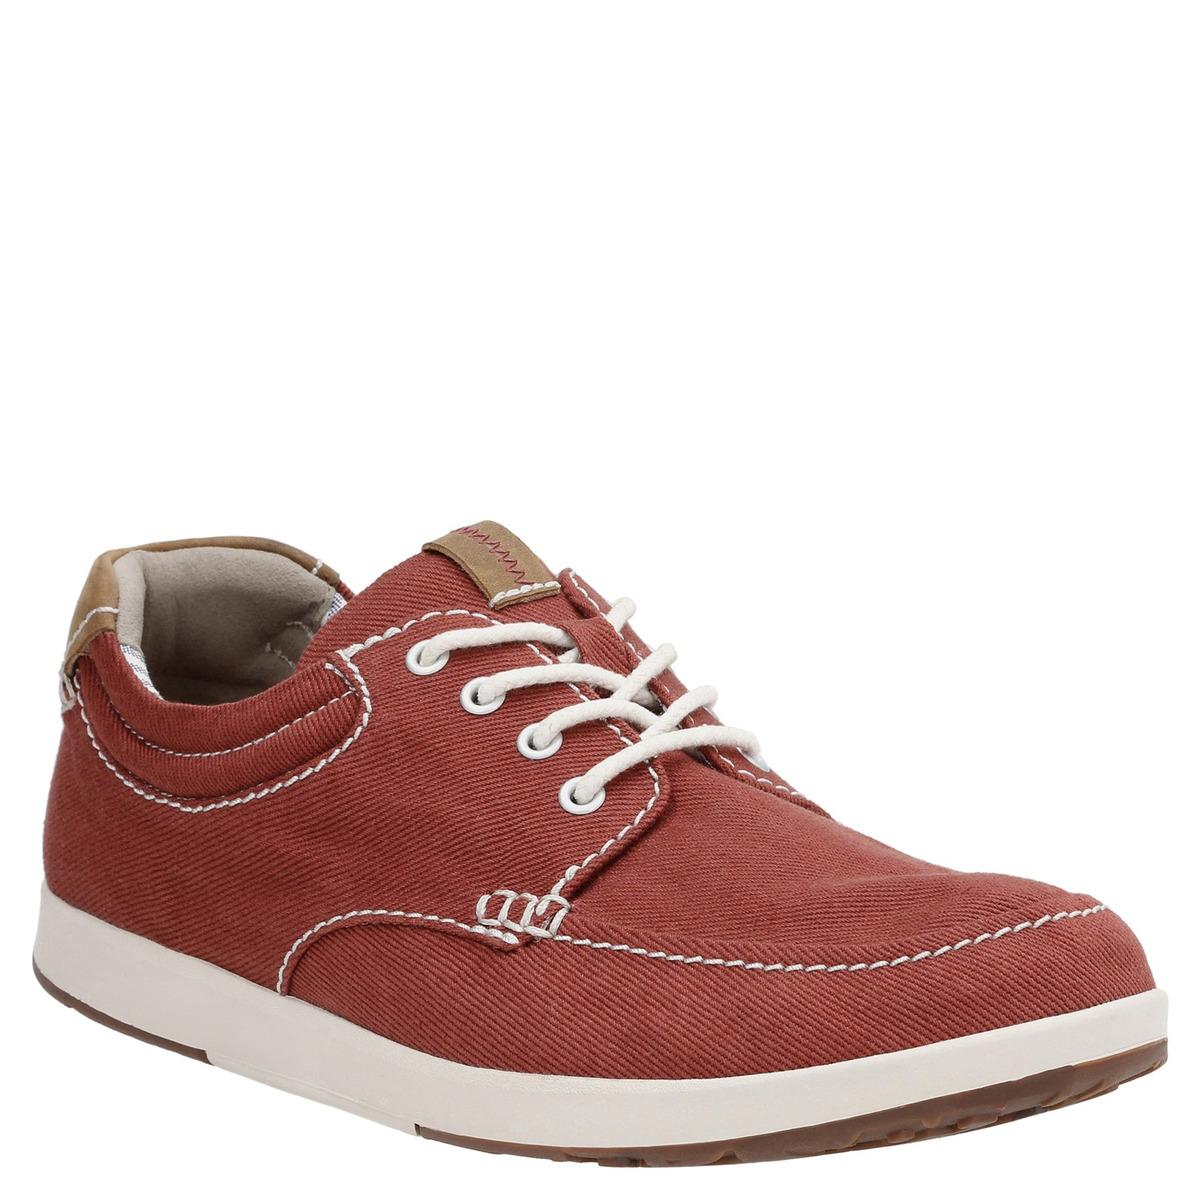 Zapato Hombre Clarks Norwin Vibe 061.245821100